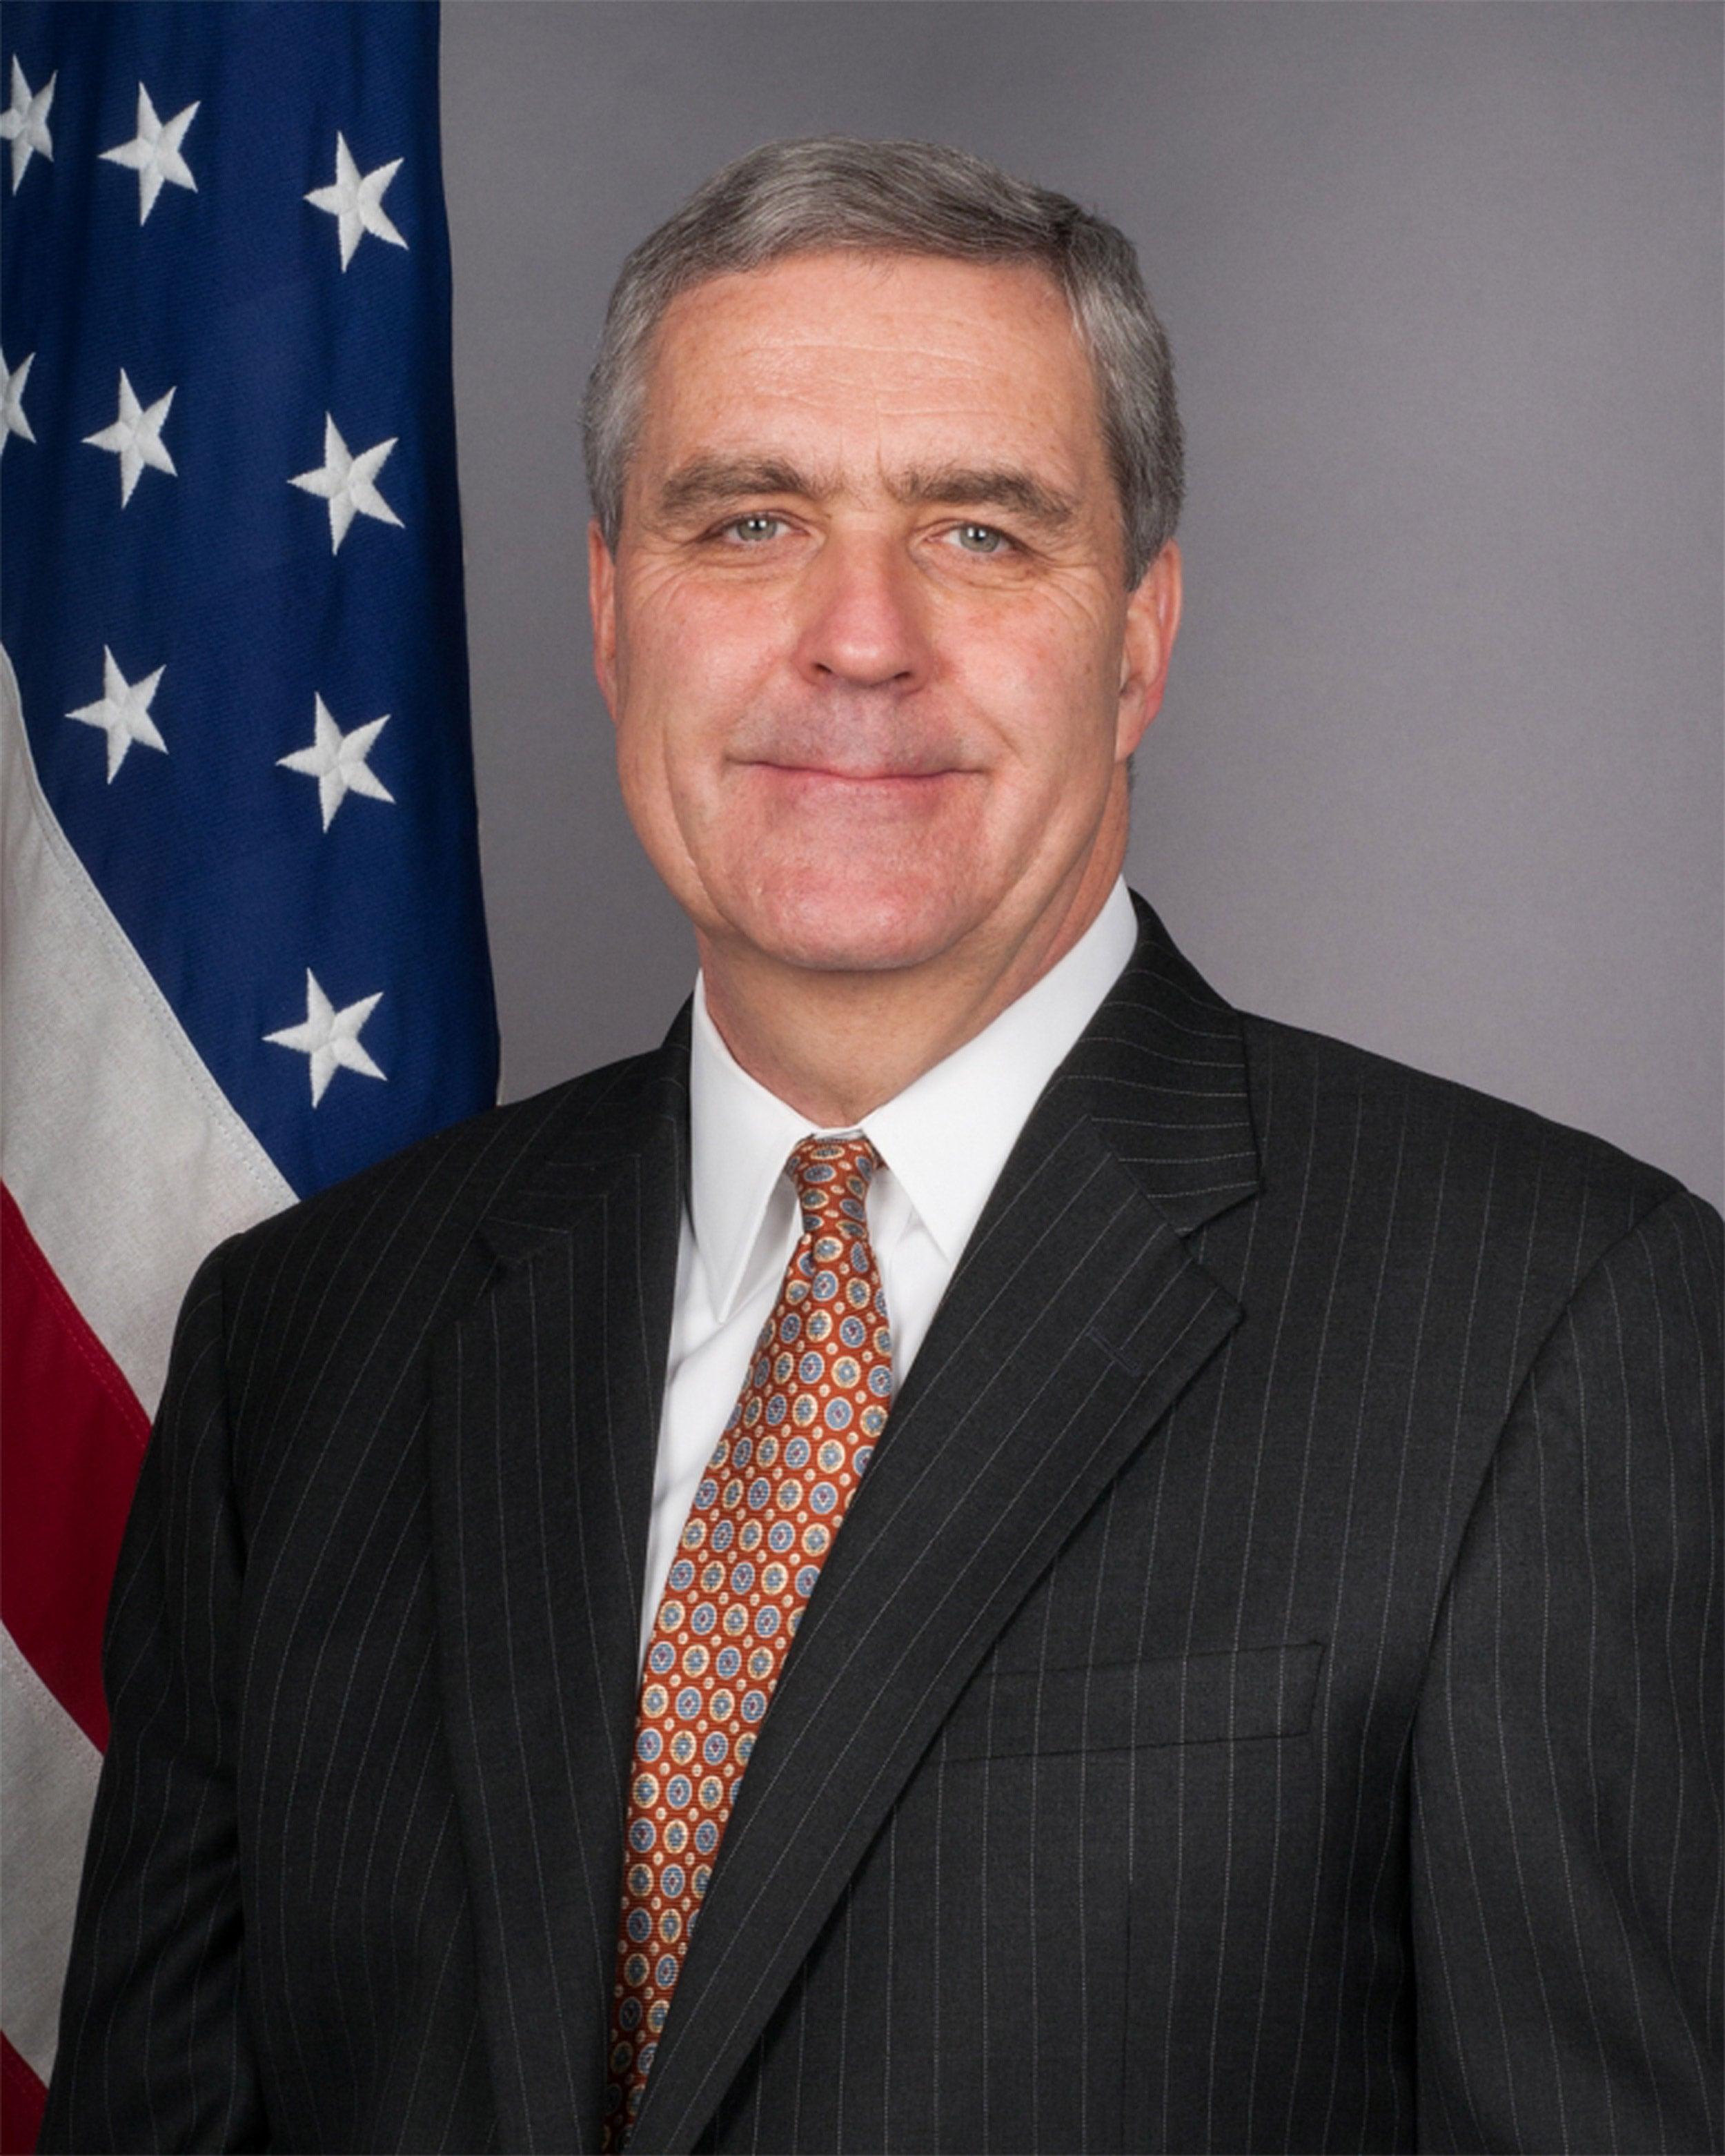 Douglas Lute